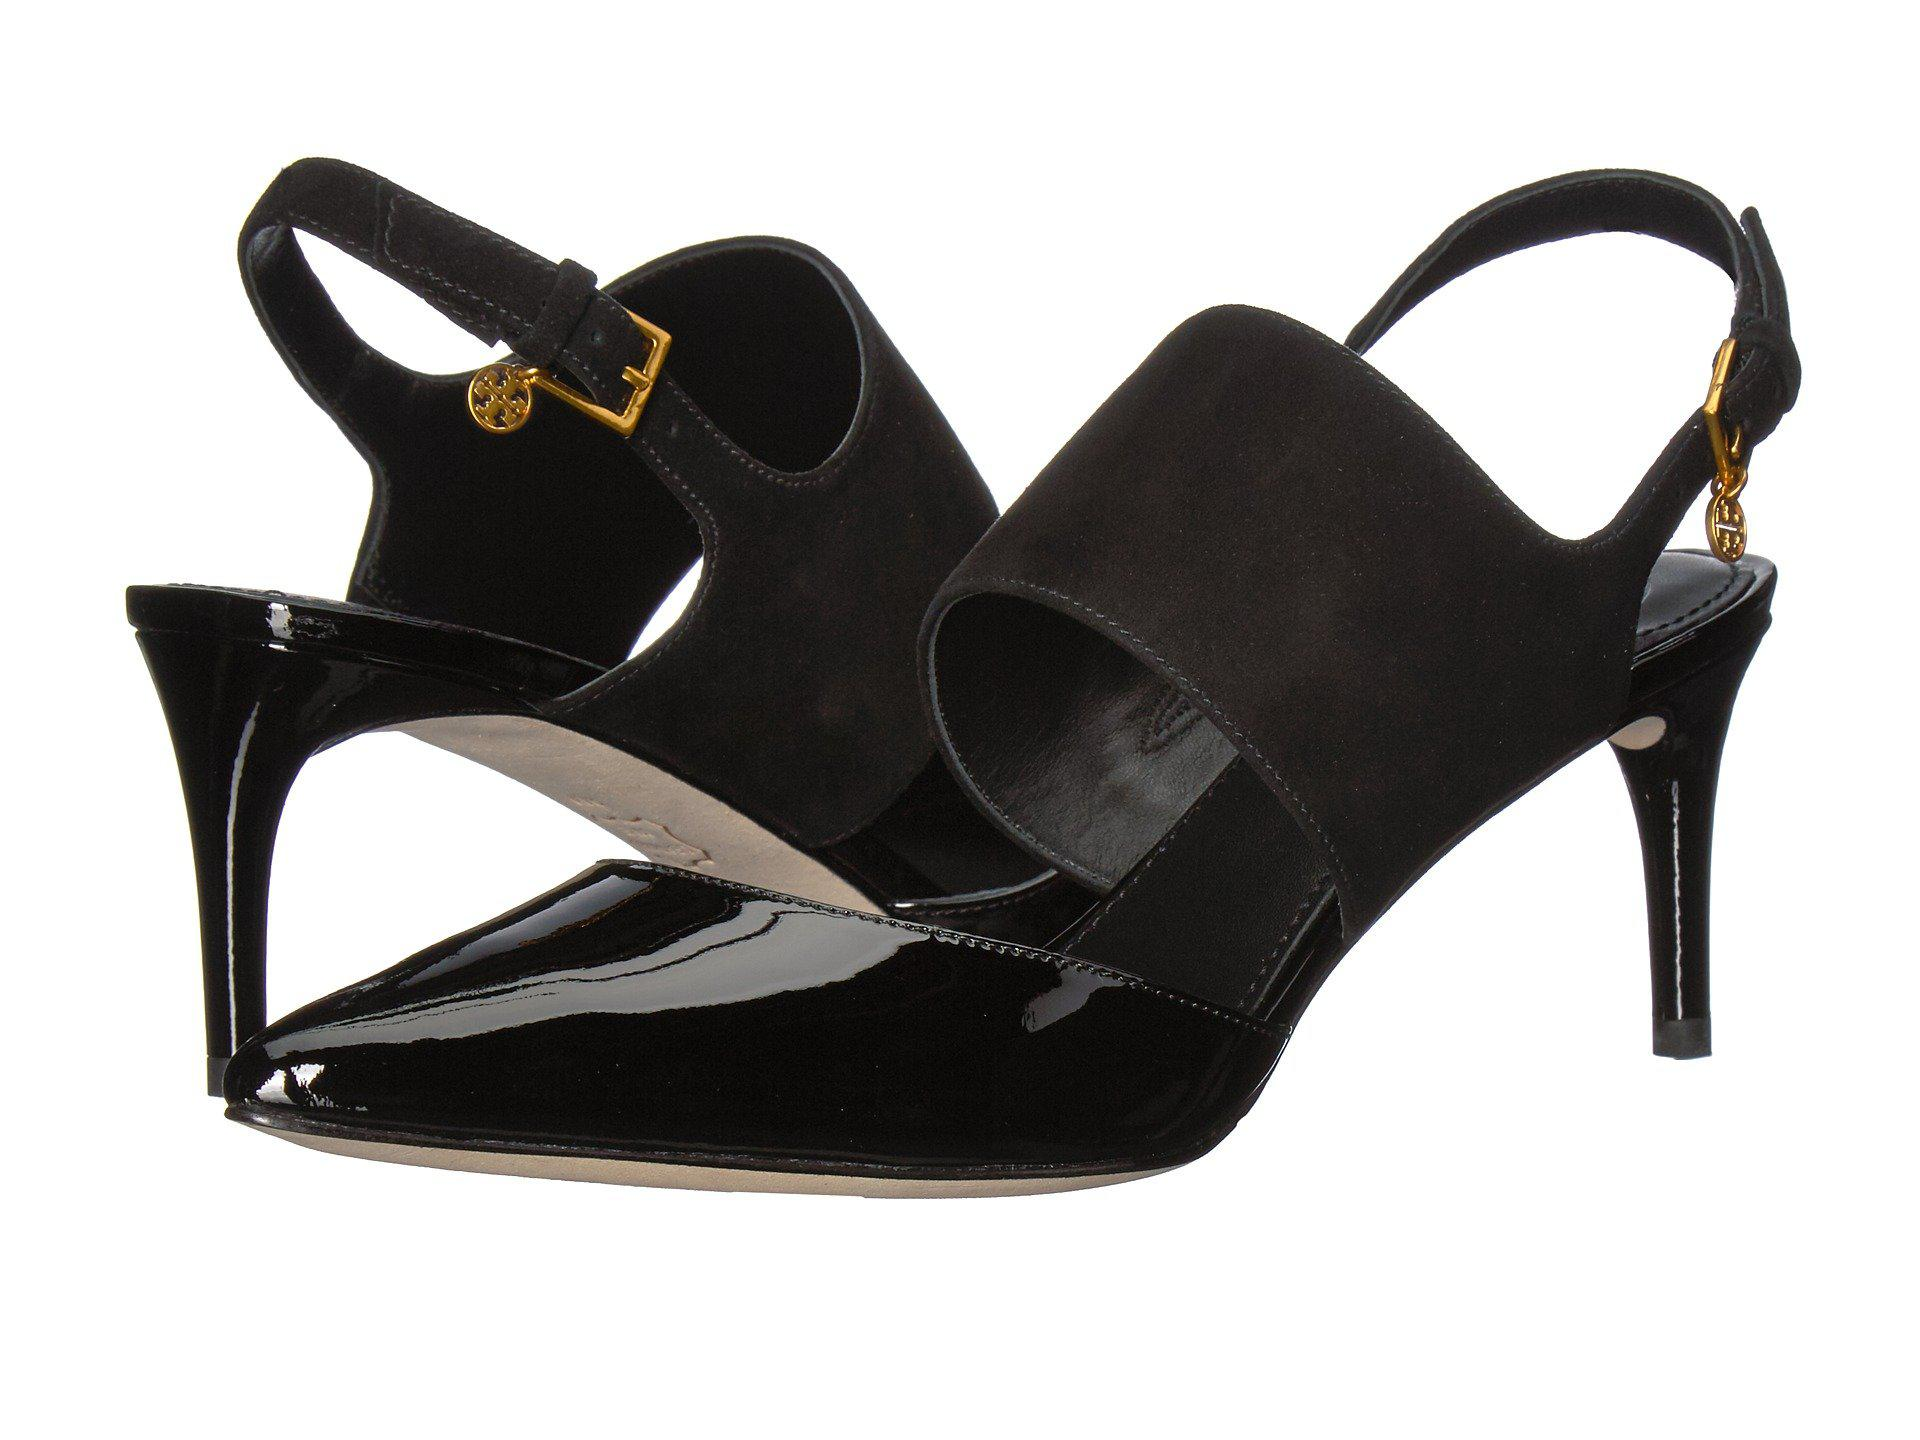 389697467be Lyst - Tory Burch Ashton 65mm Sandal in Black